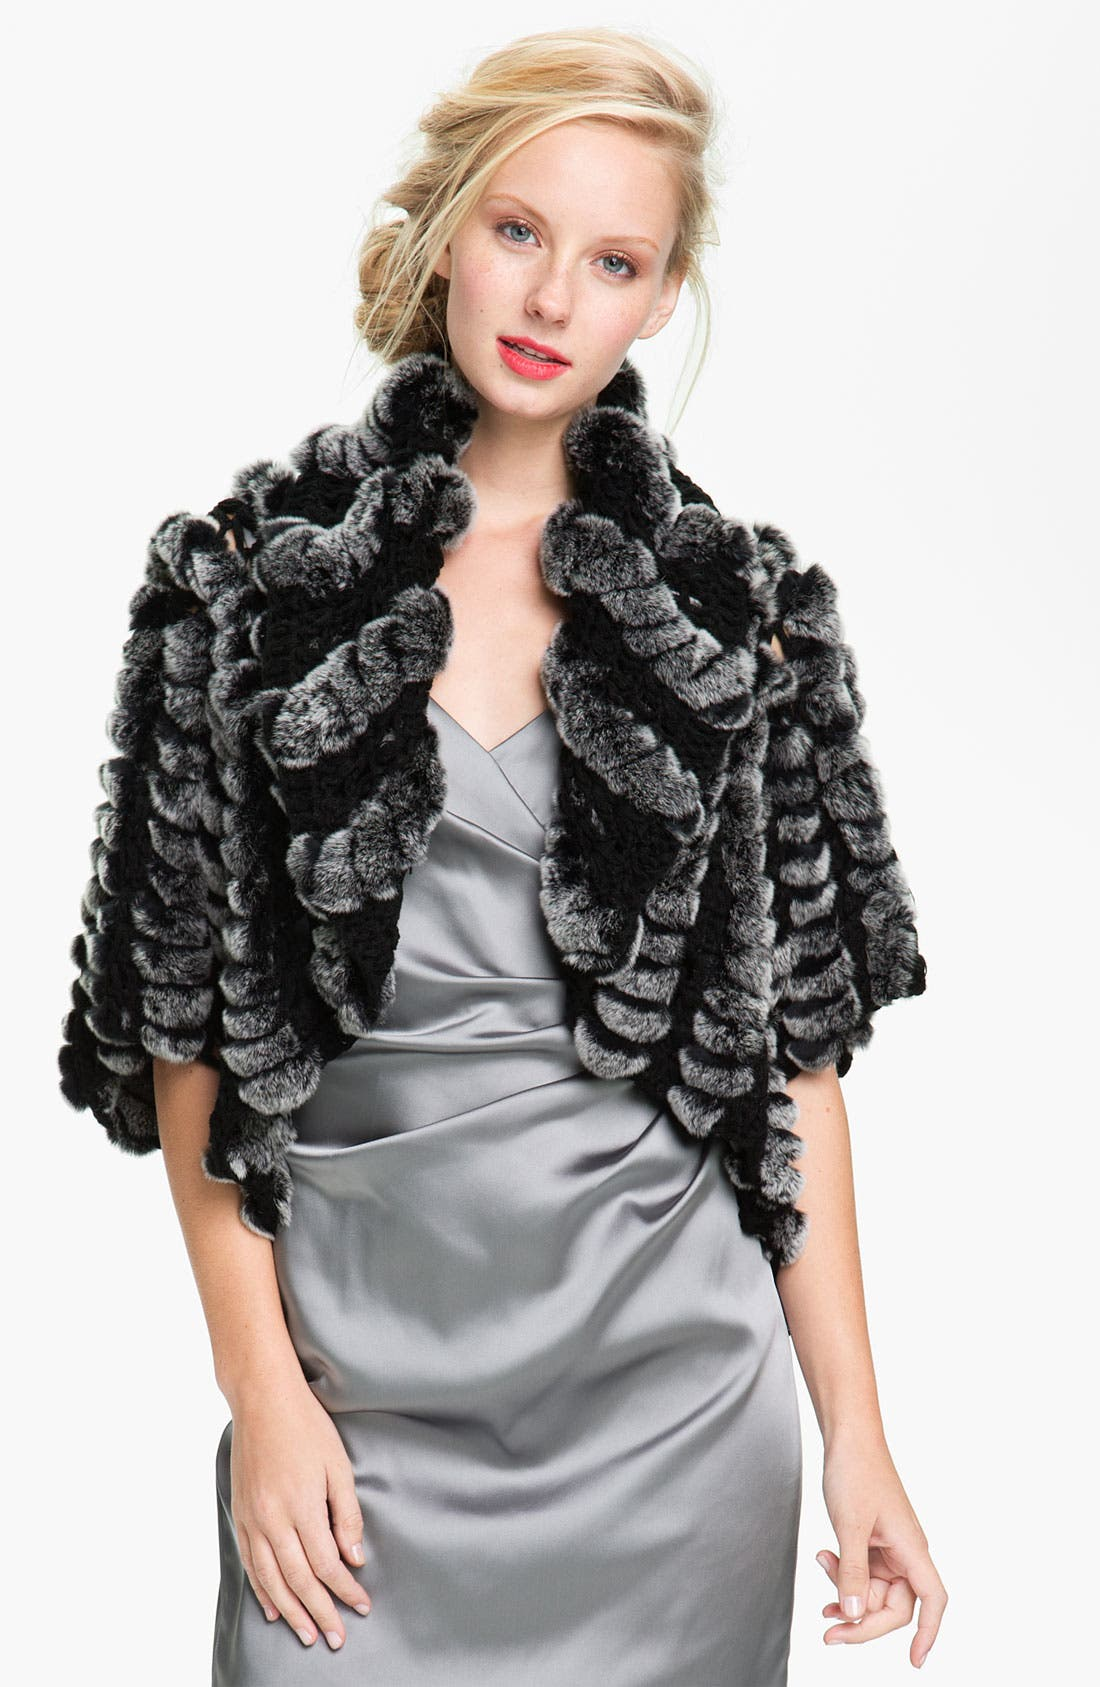 Main Image - Alexia Admor Crochet & Genuine Rabbit Fur Capelet